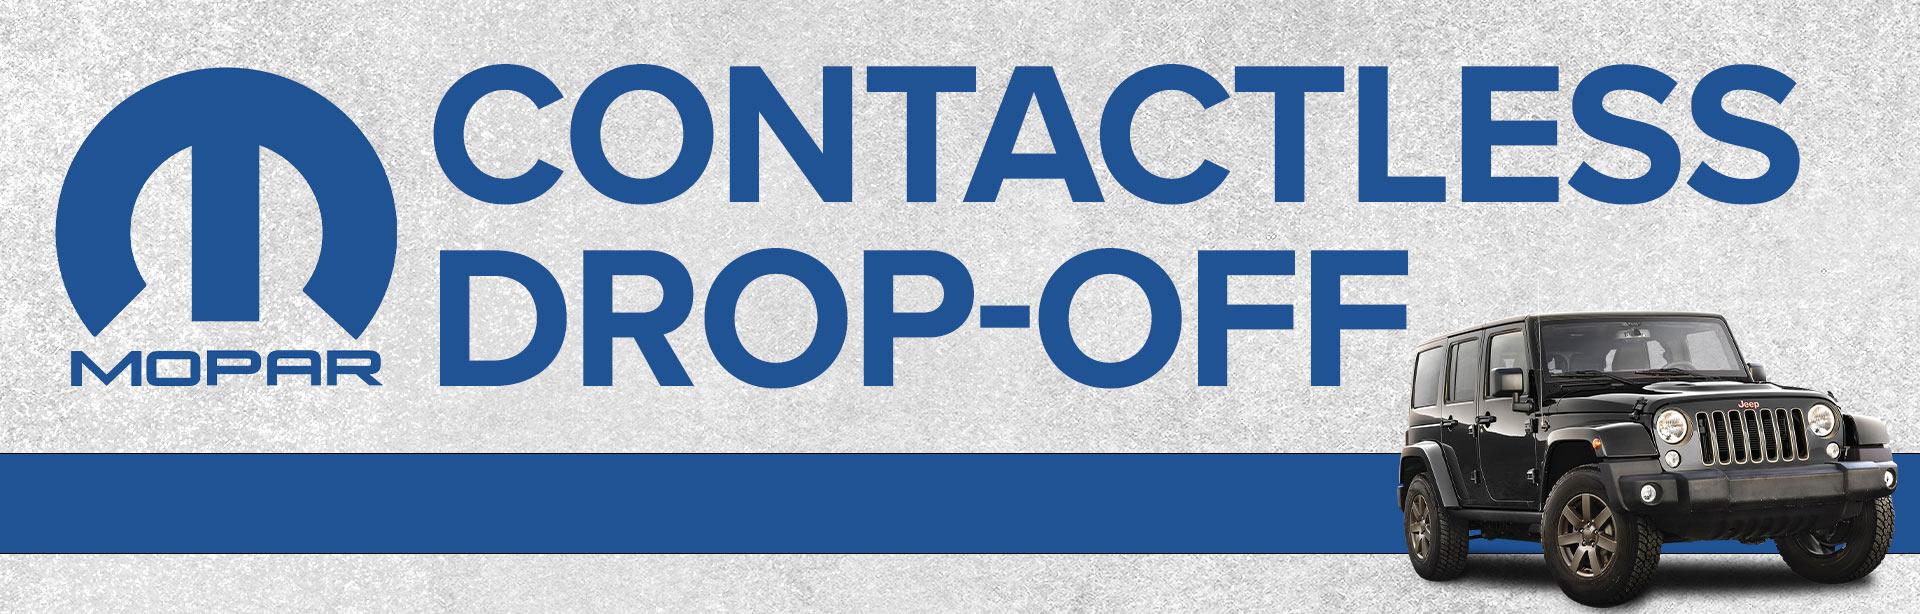 Contactless Mopar Drop Off